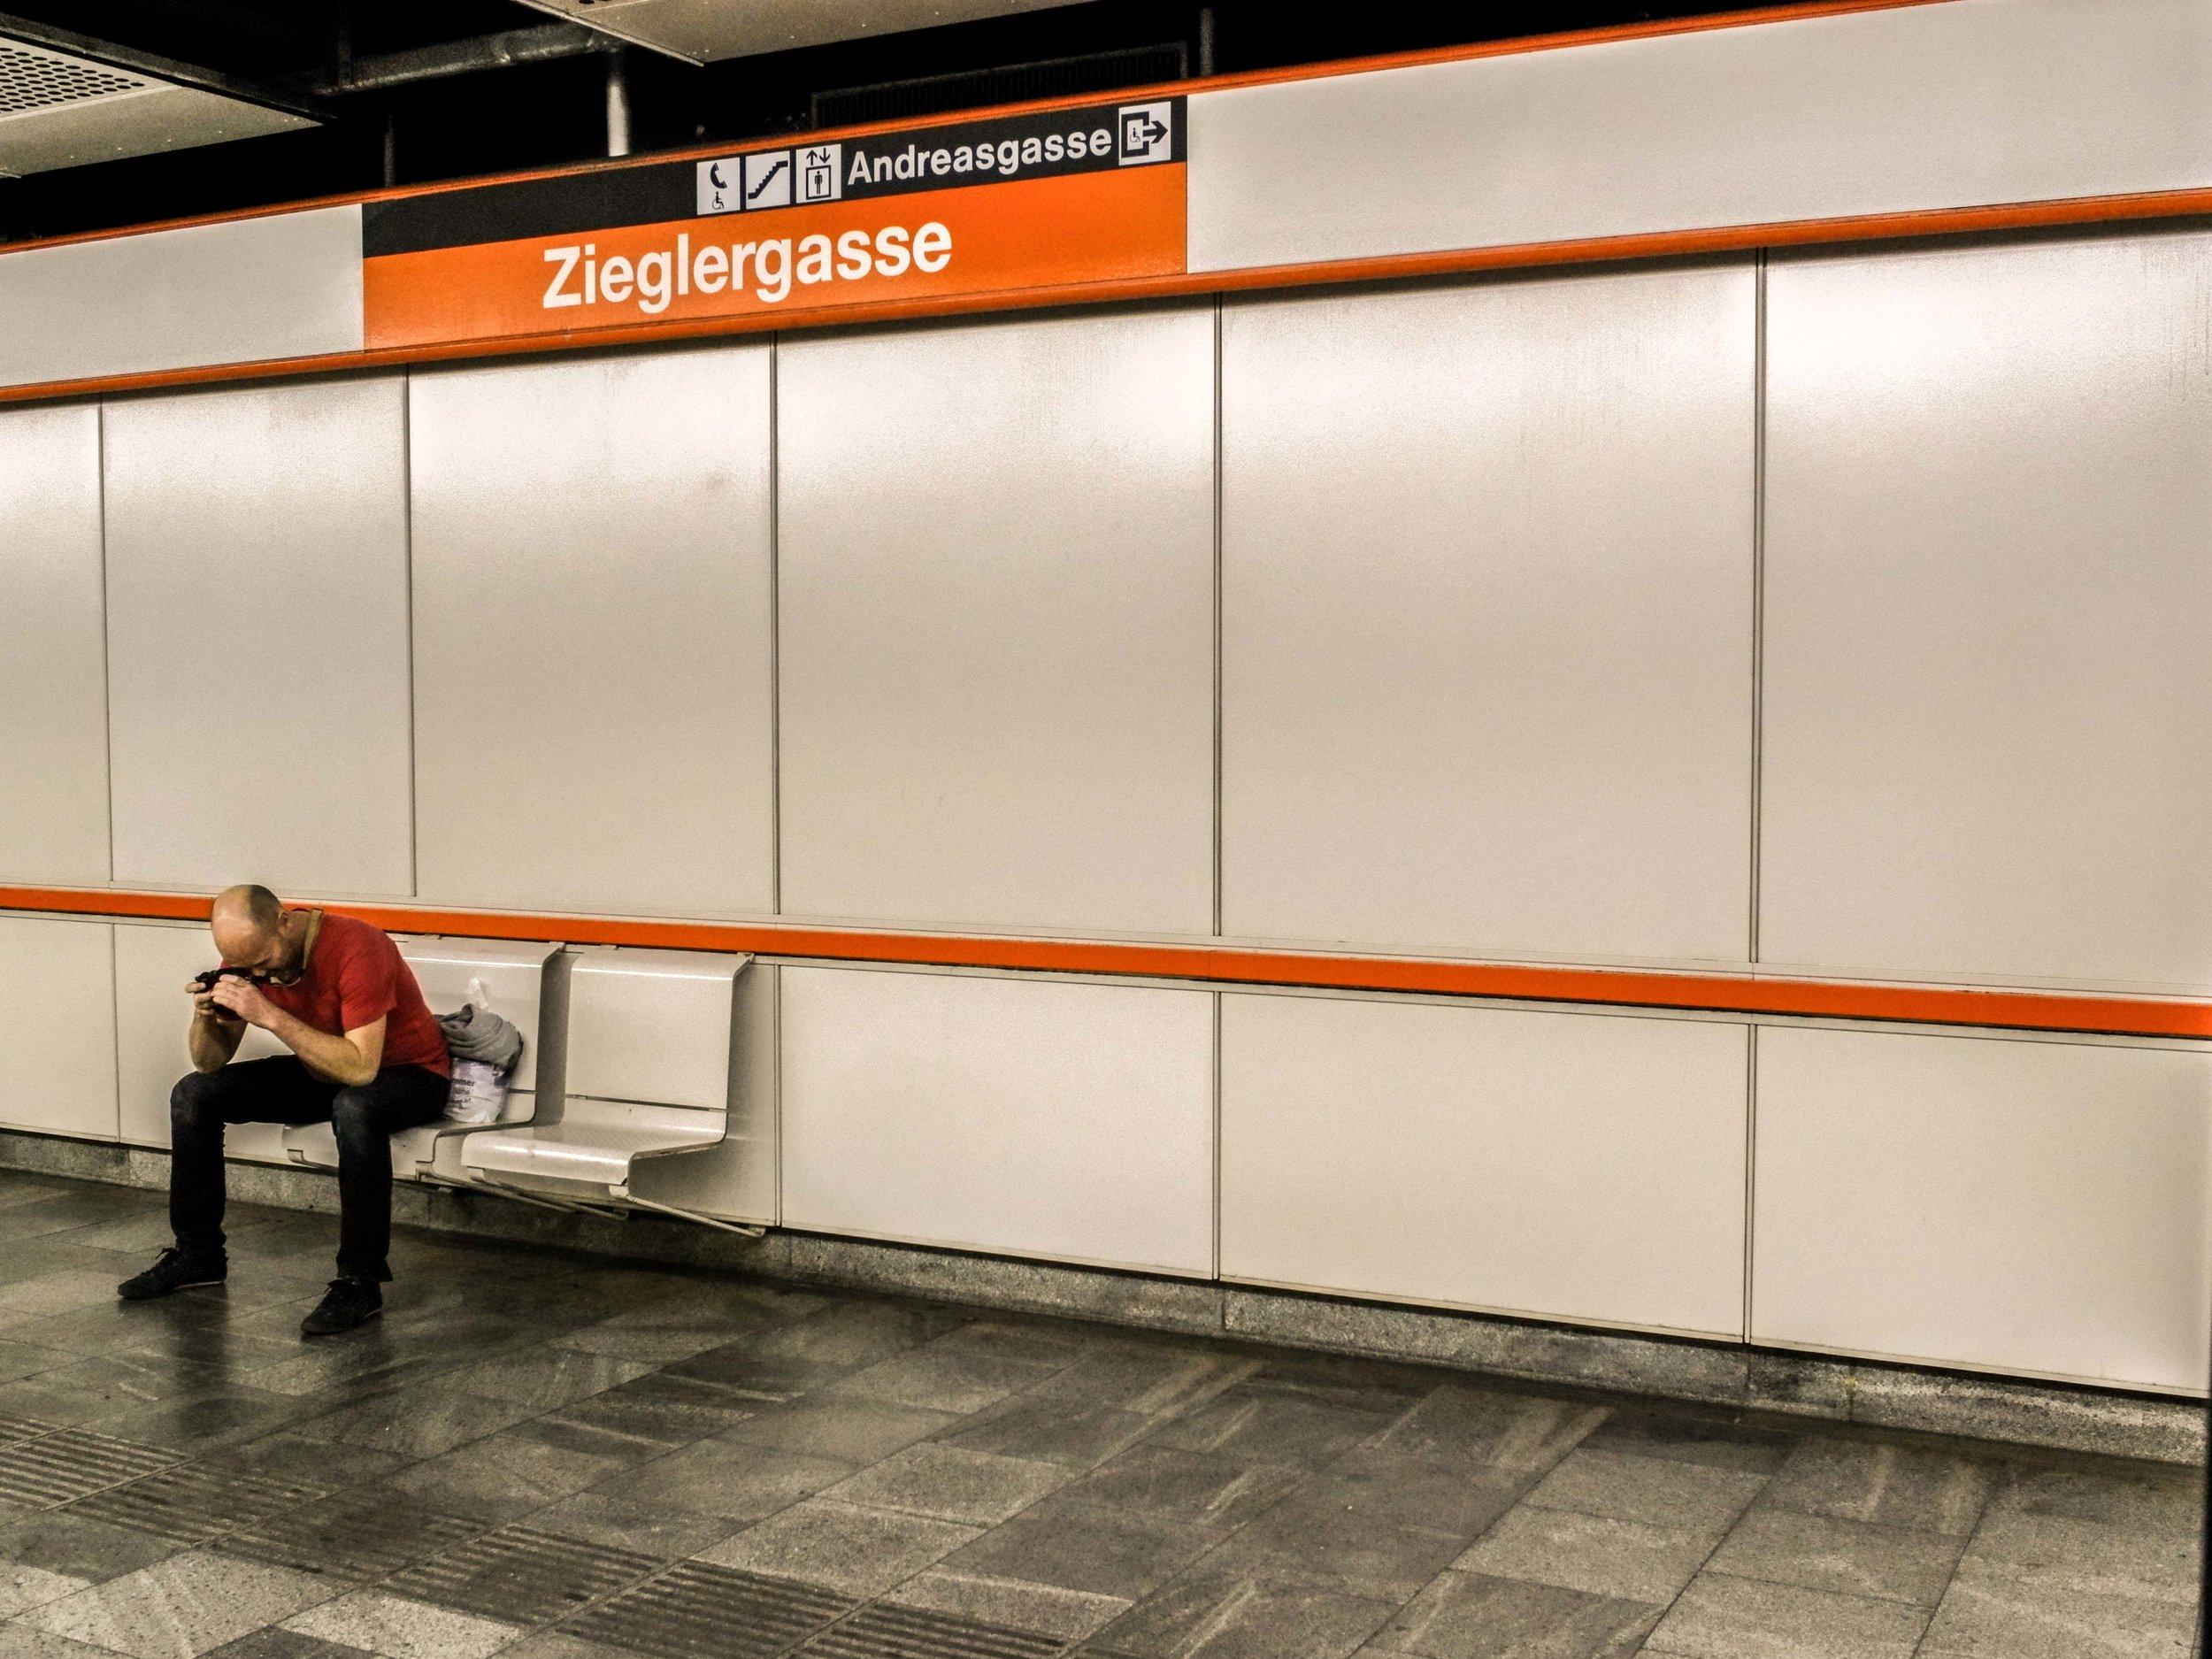 Vienna subway station